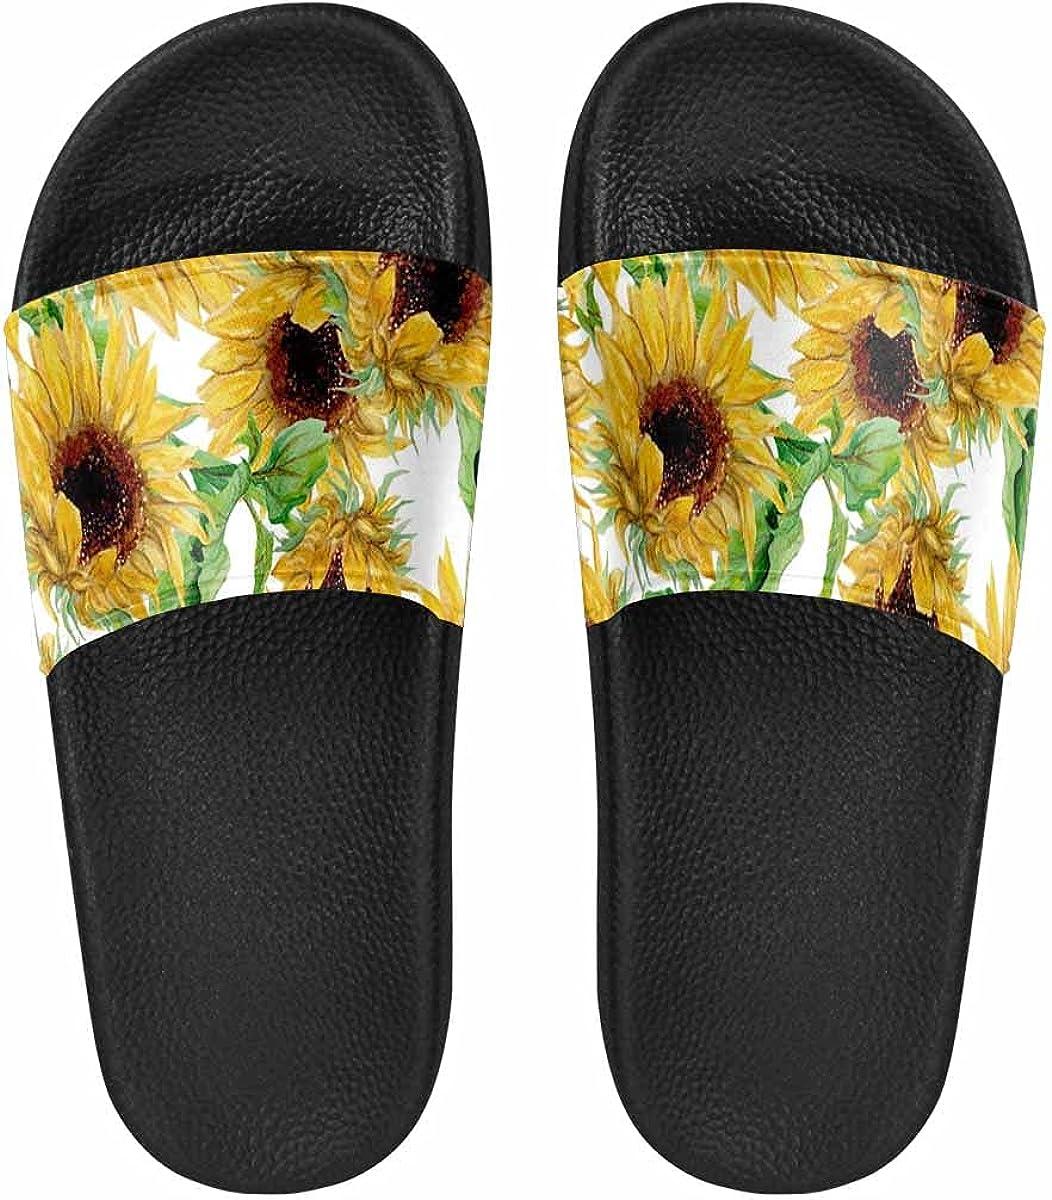 InterestPrint White Swan at Night Under the Moon Women's Slide Sandal Summer Beach Travel Sandal Indoor Shoes